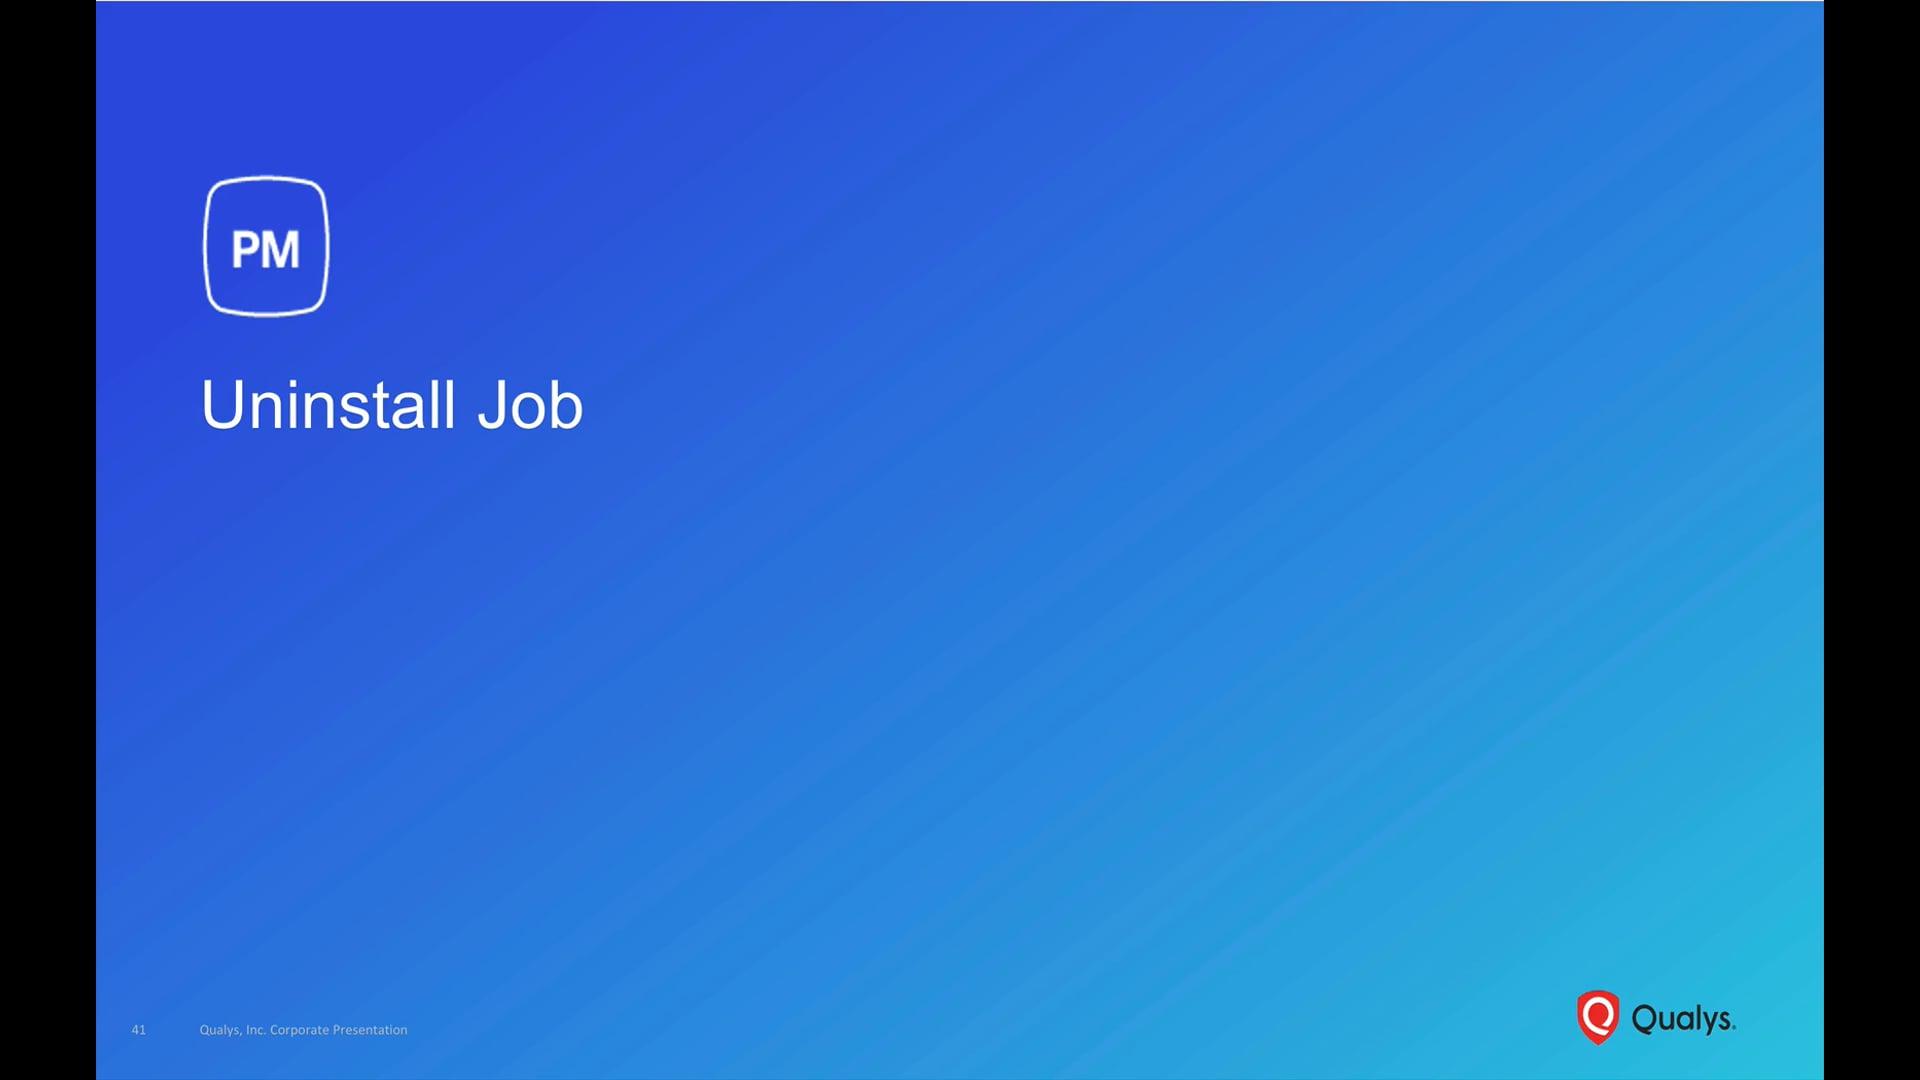 PM Uninstall Job